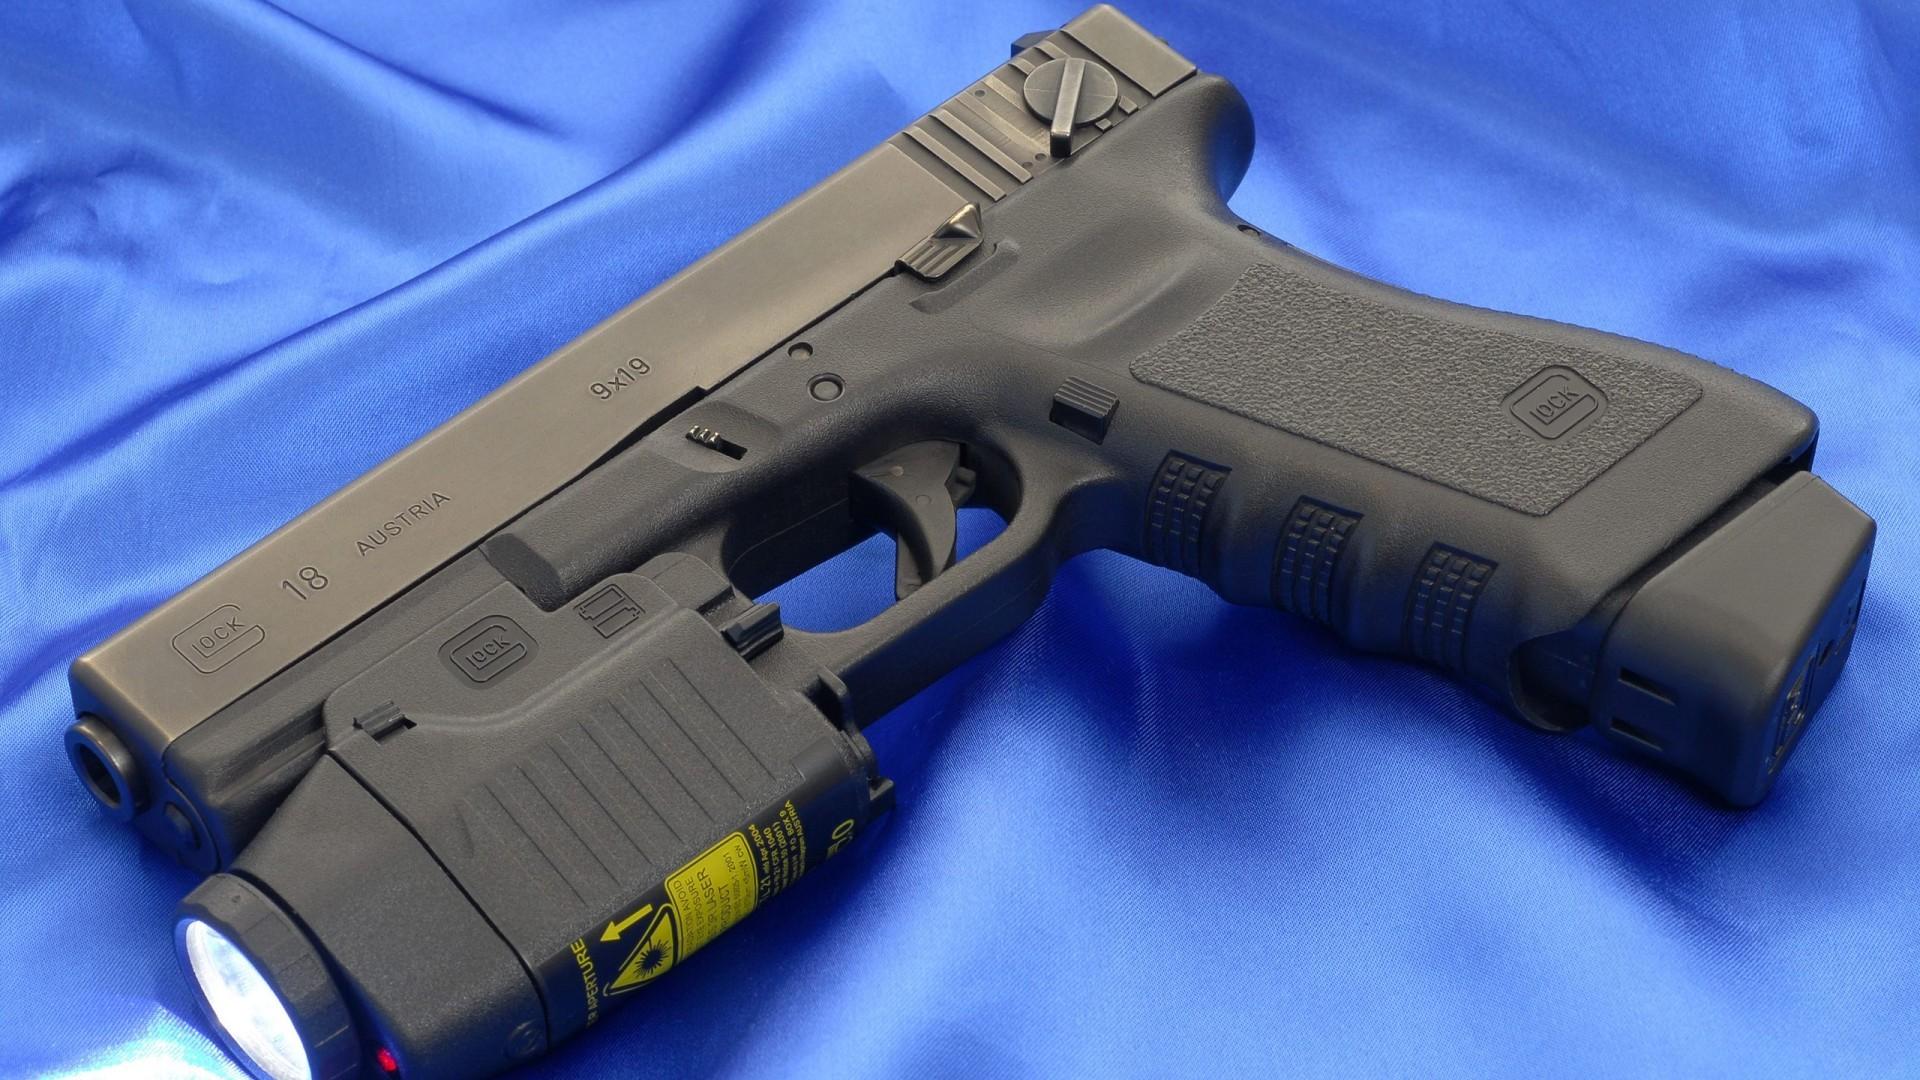 Glock 18 Automatic Pistol Wallpaper